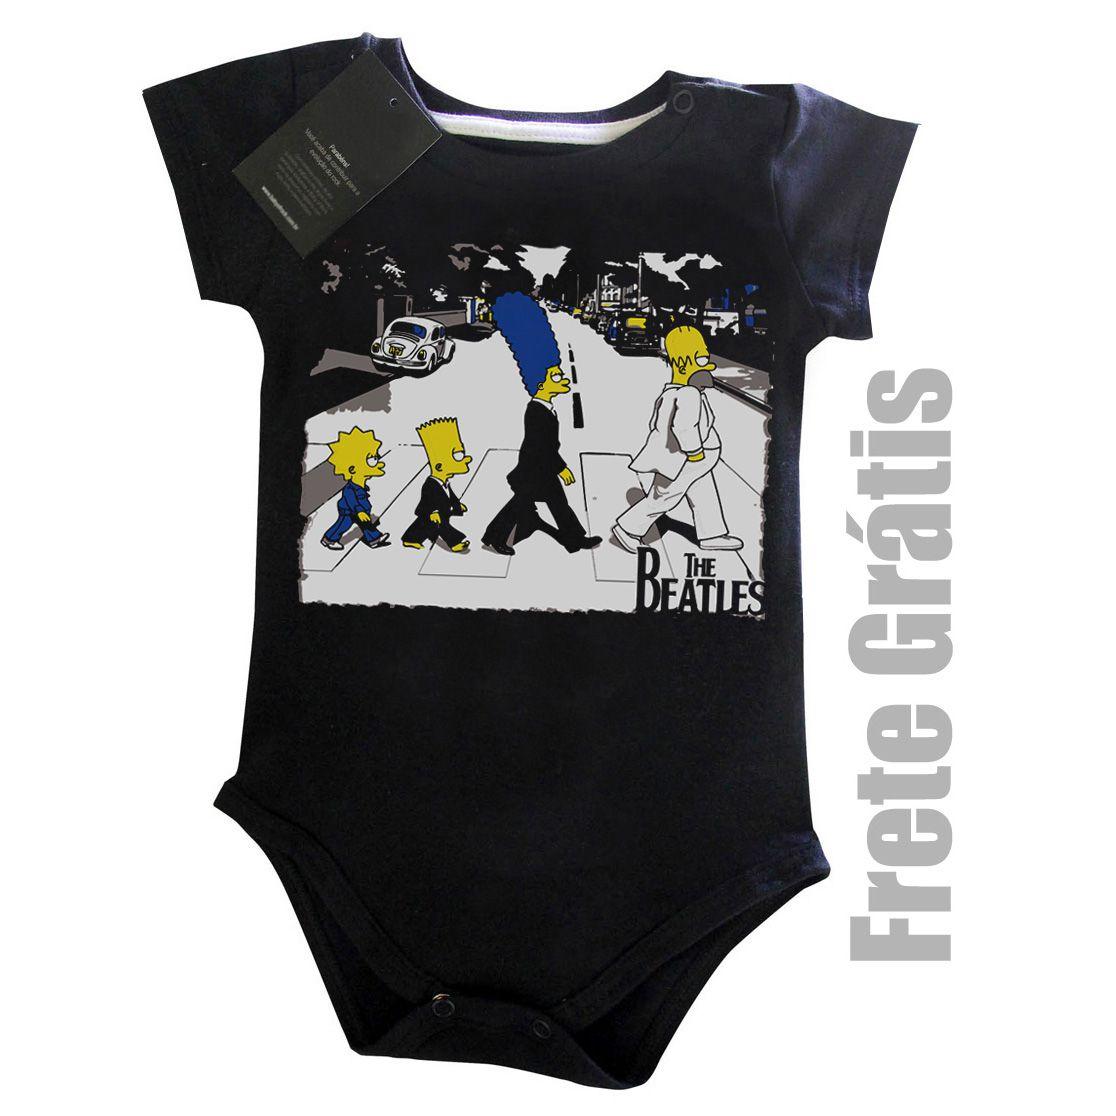 Body Bebe de Rock - The Beatles Simpsons  - Black  - Baby Monster S/A